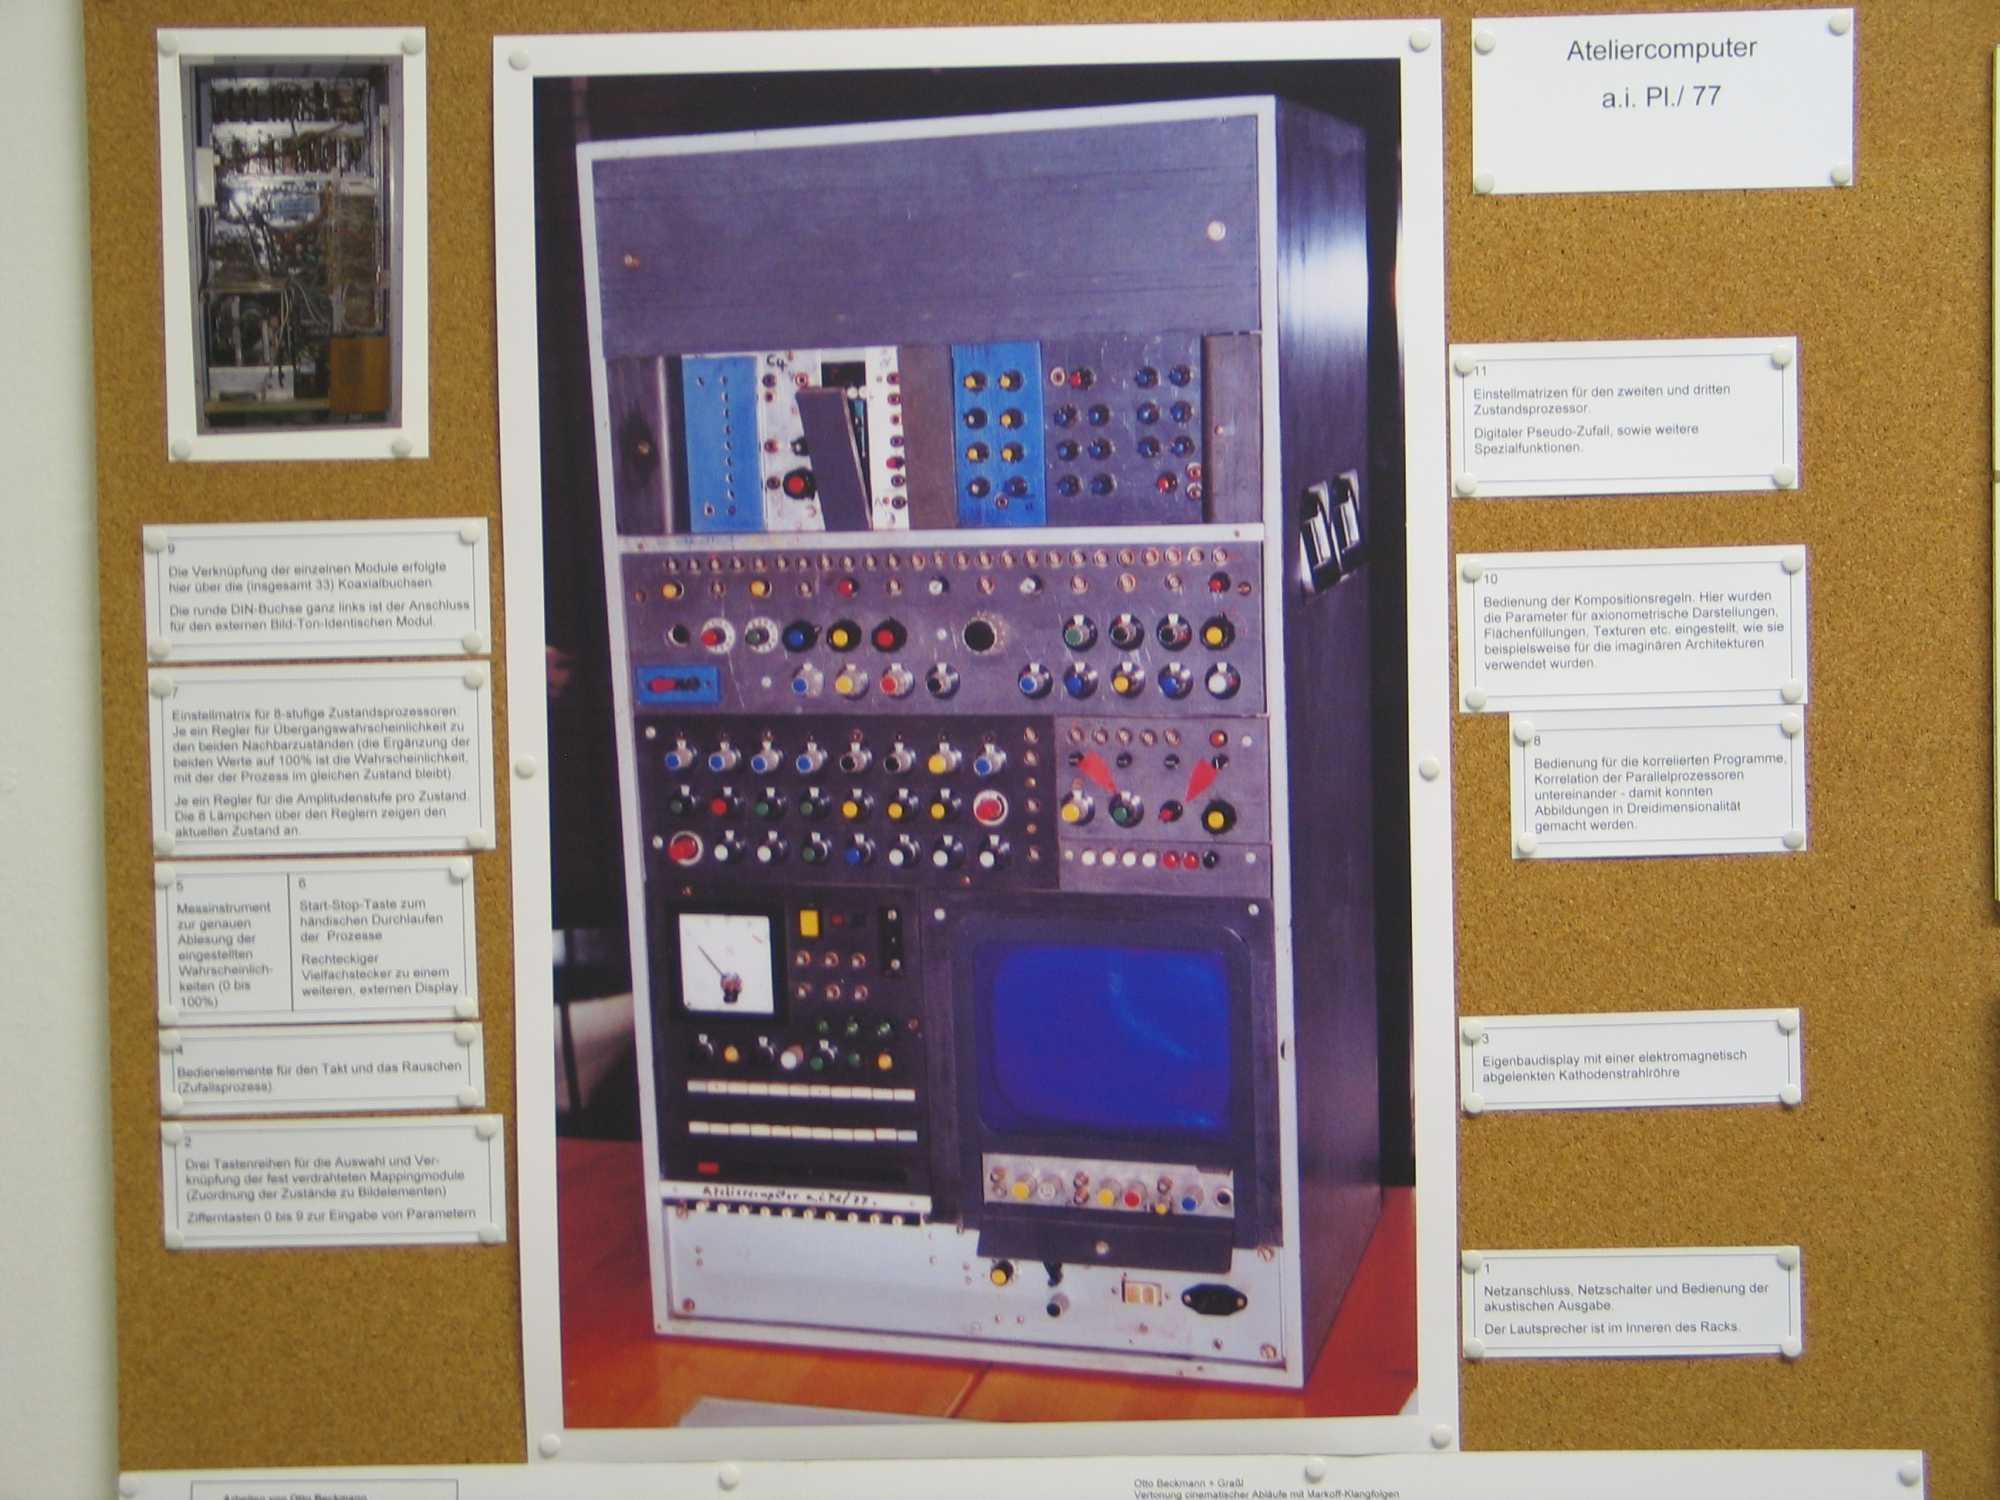 Atelier-Computer